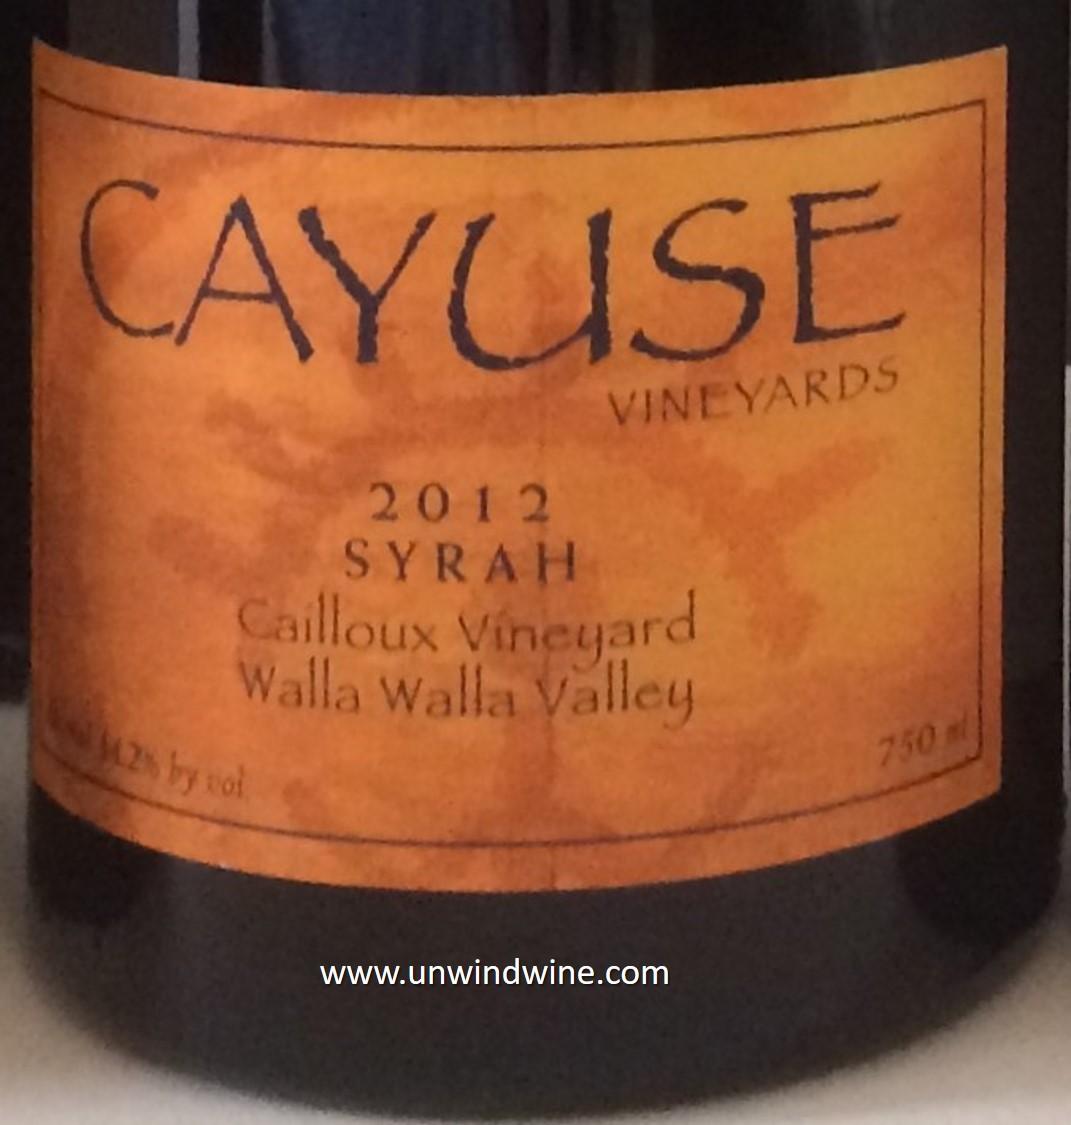 Unwindwine 09 18 16 for Cayuse vineyards